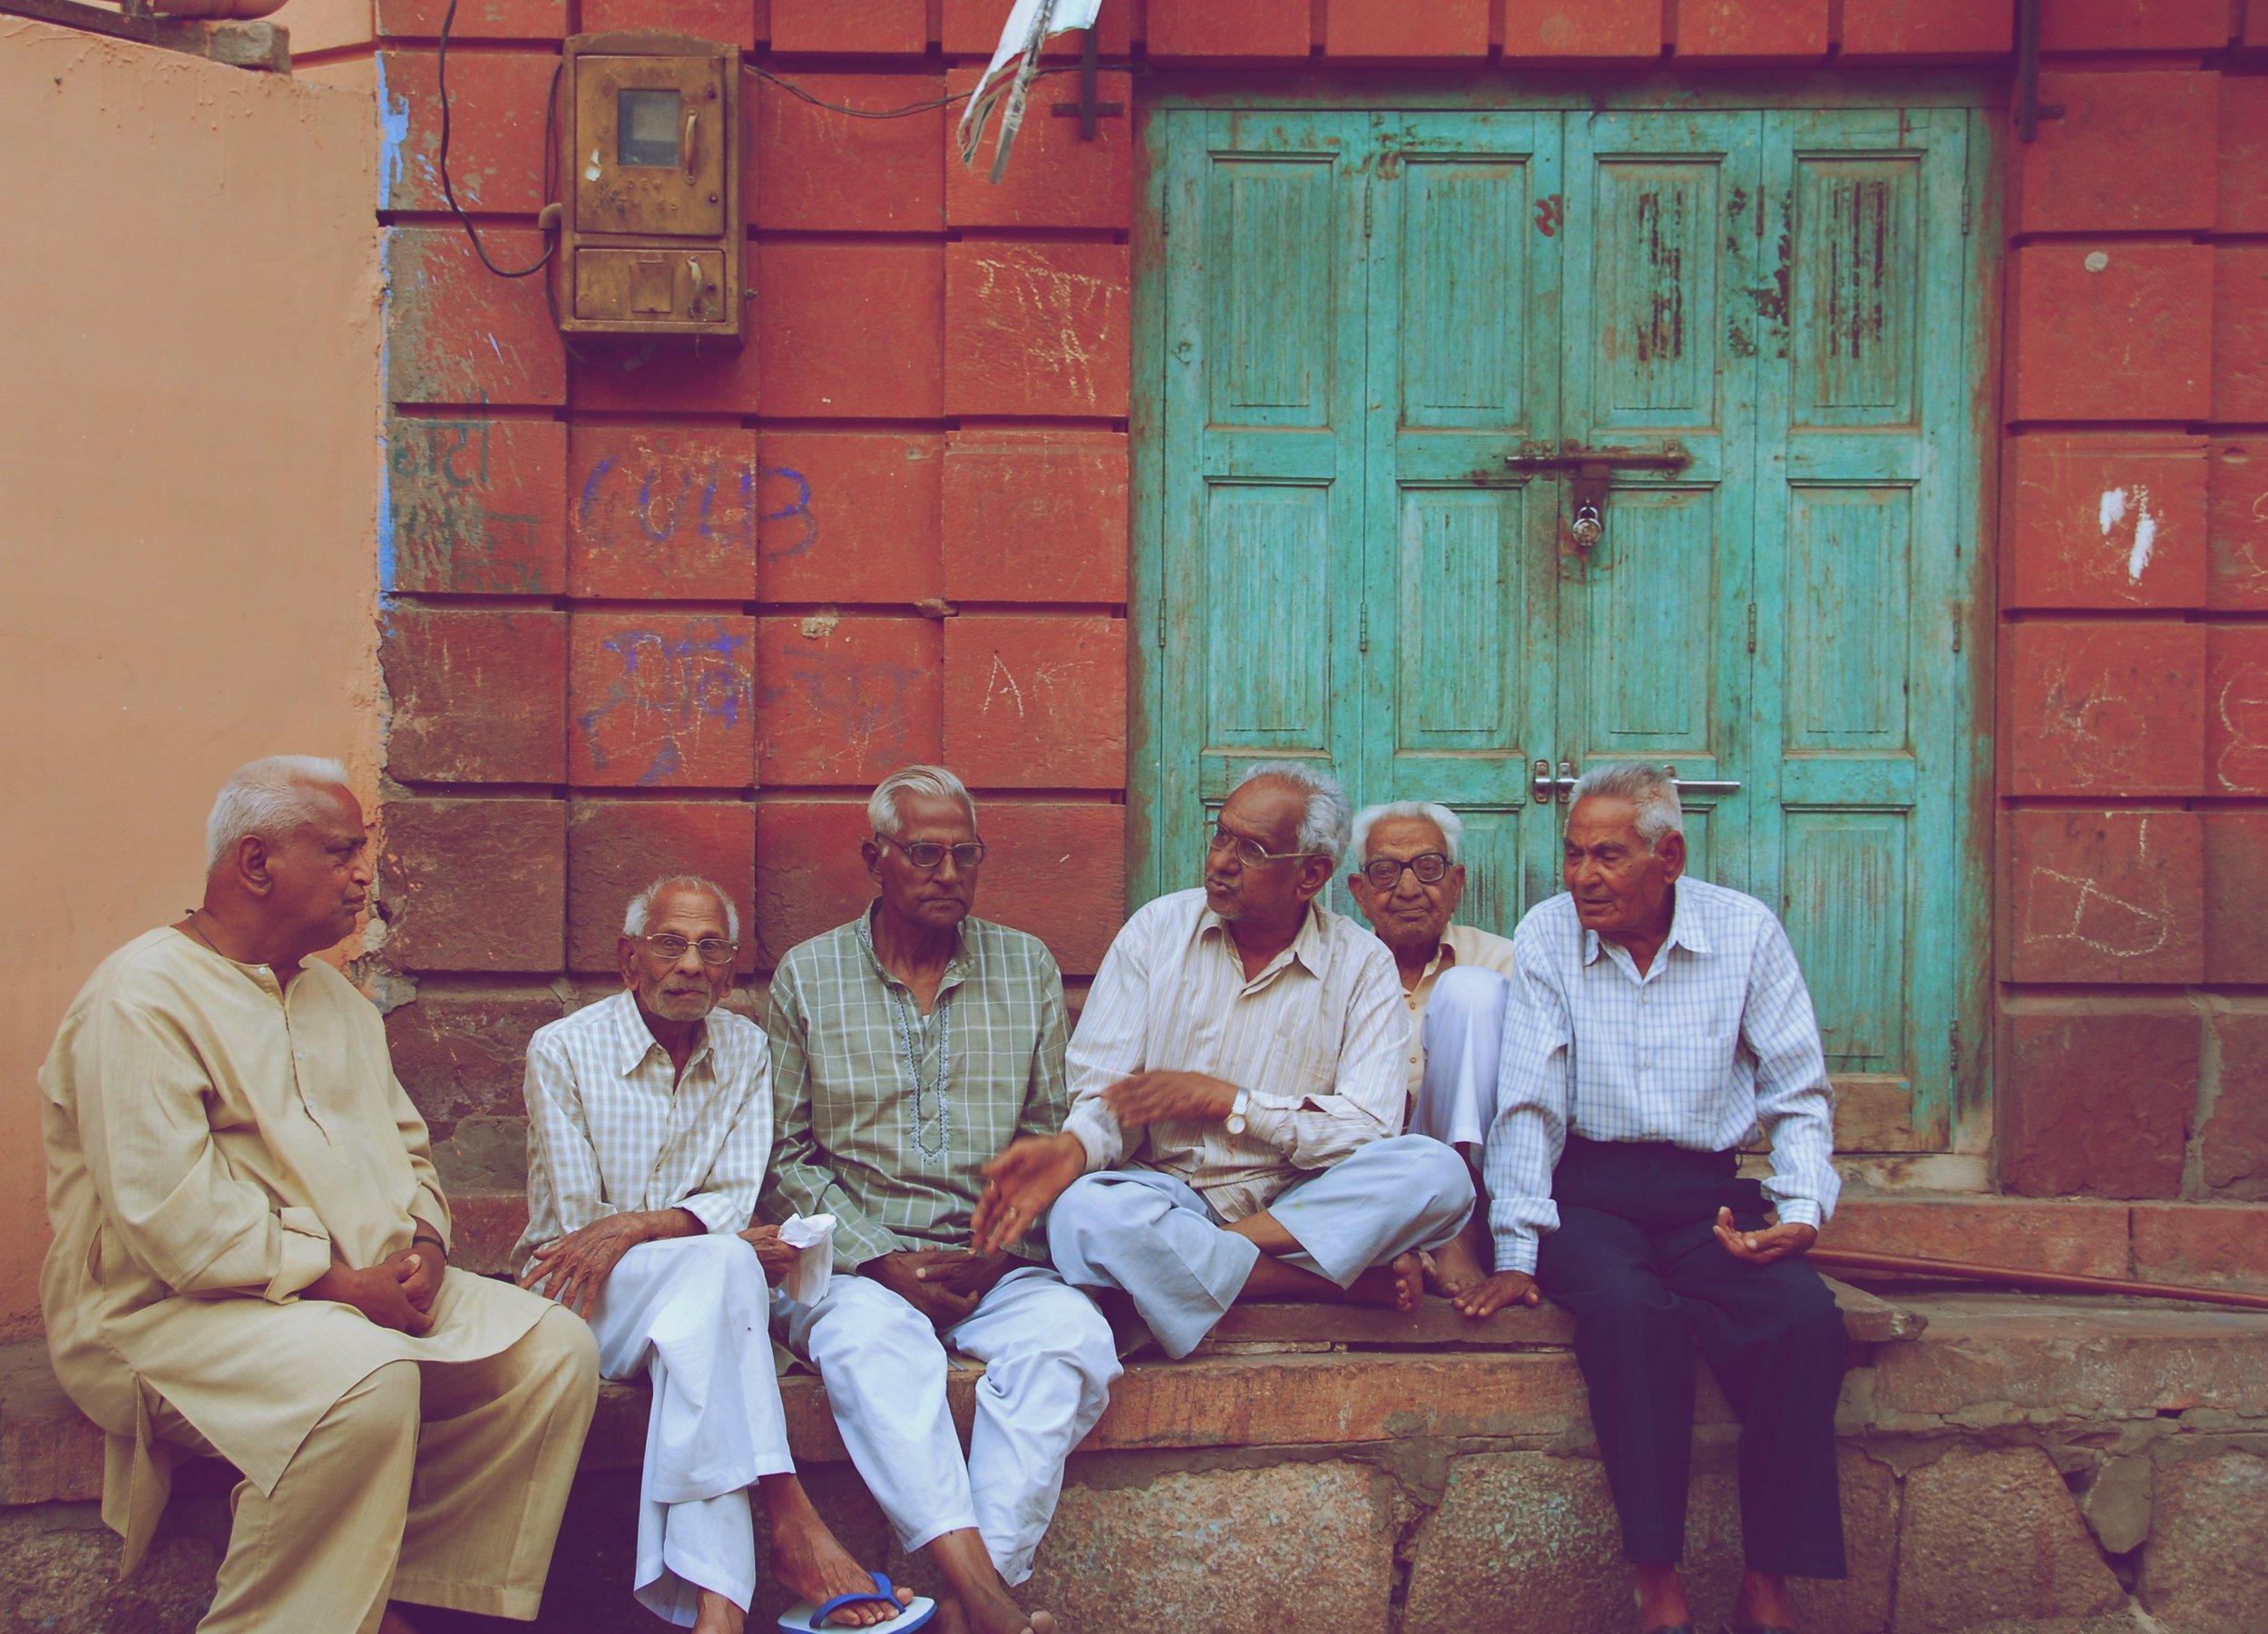 19.Lefteris_Parasyris_India_Coexist_2012_ 19.jpg